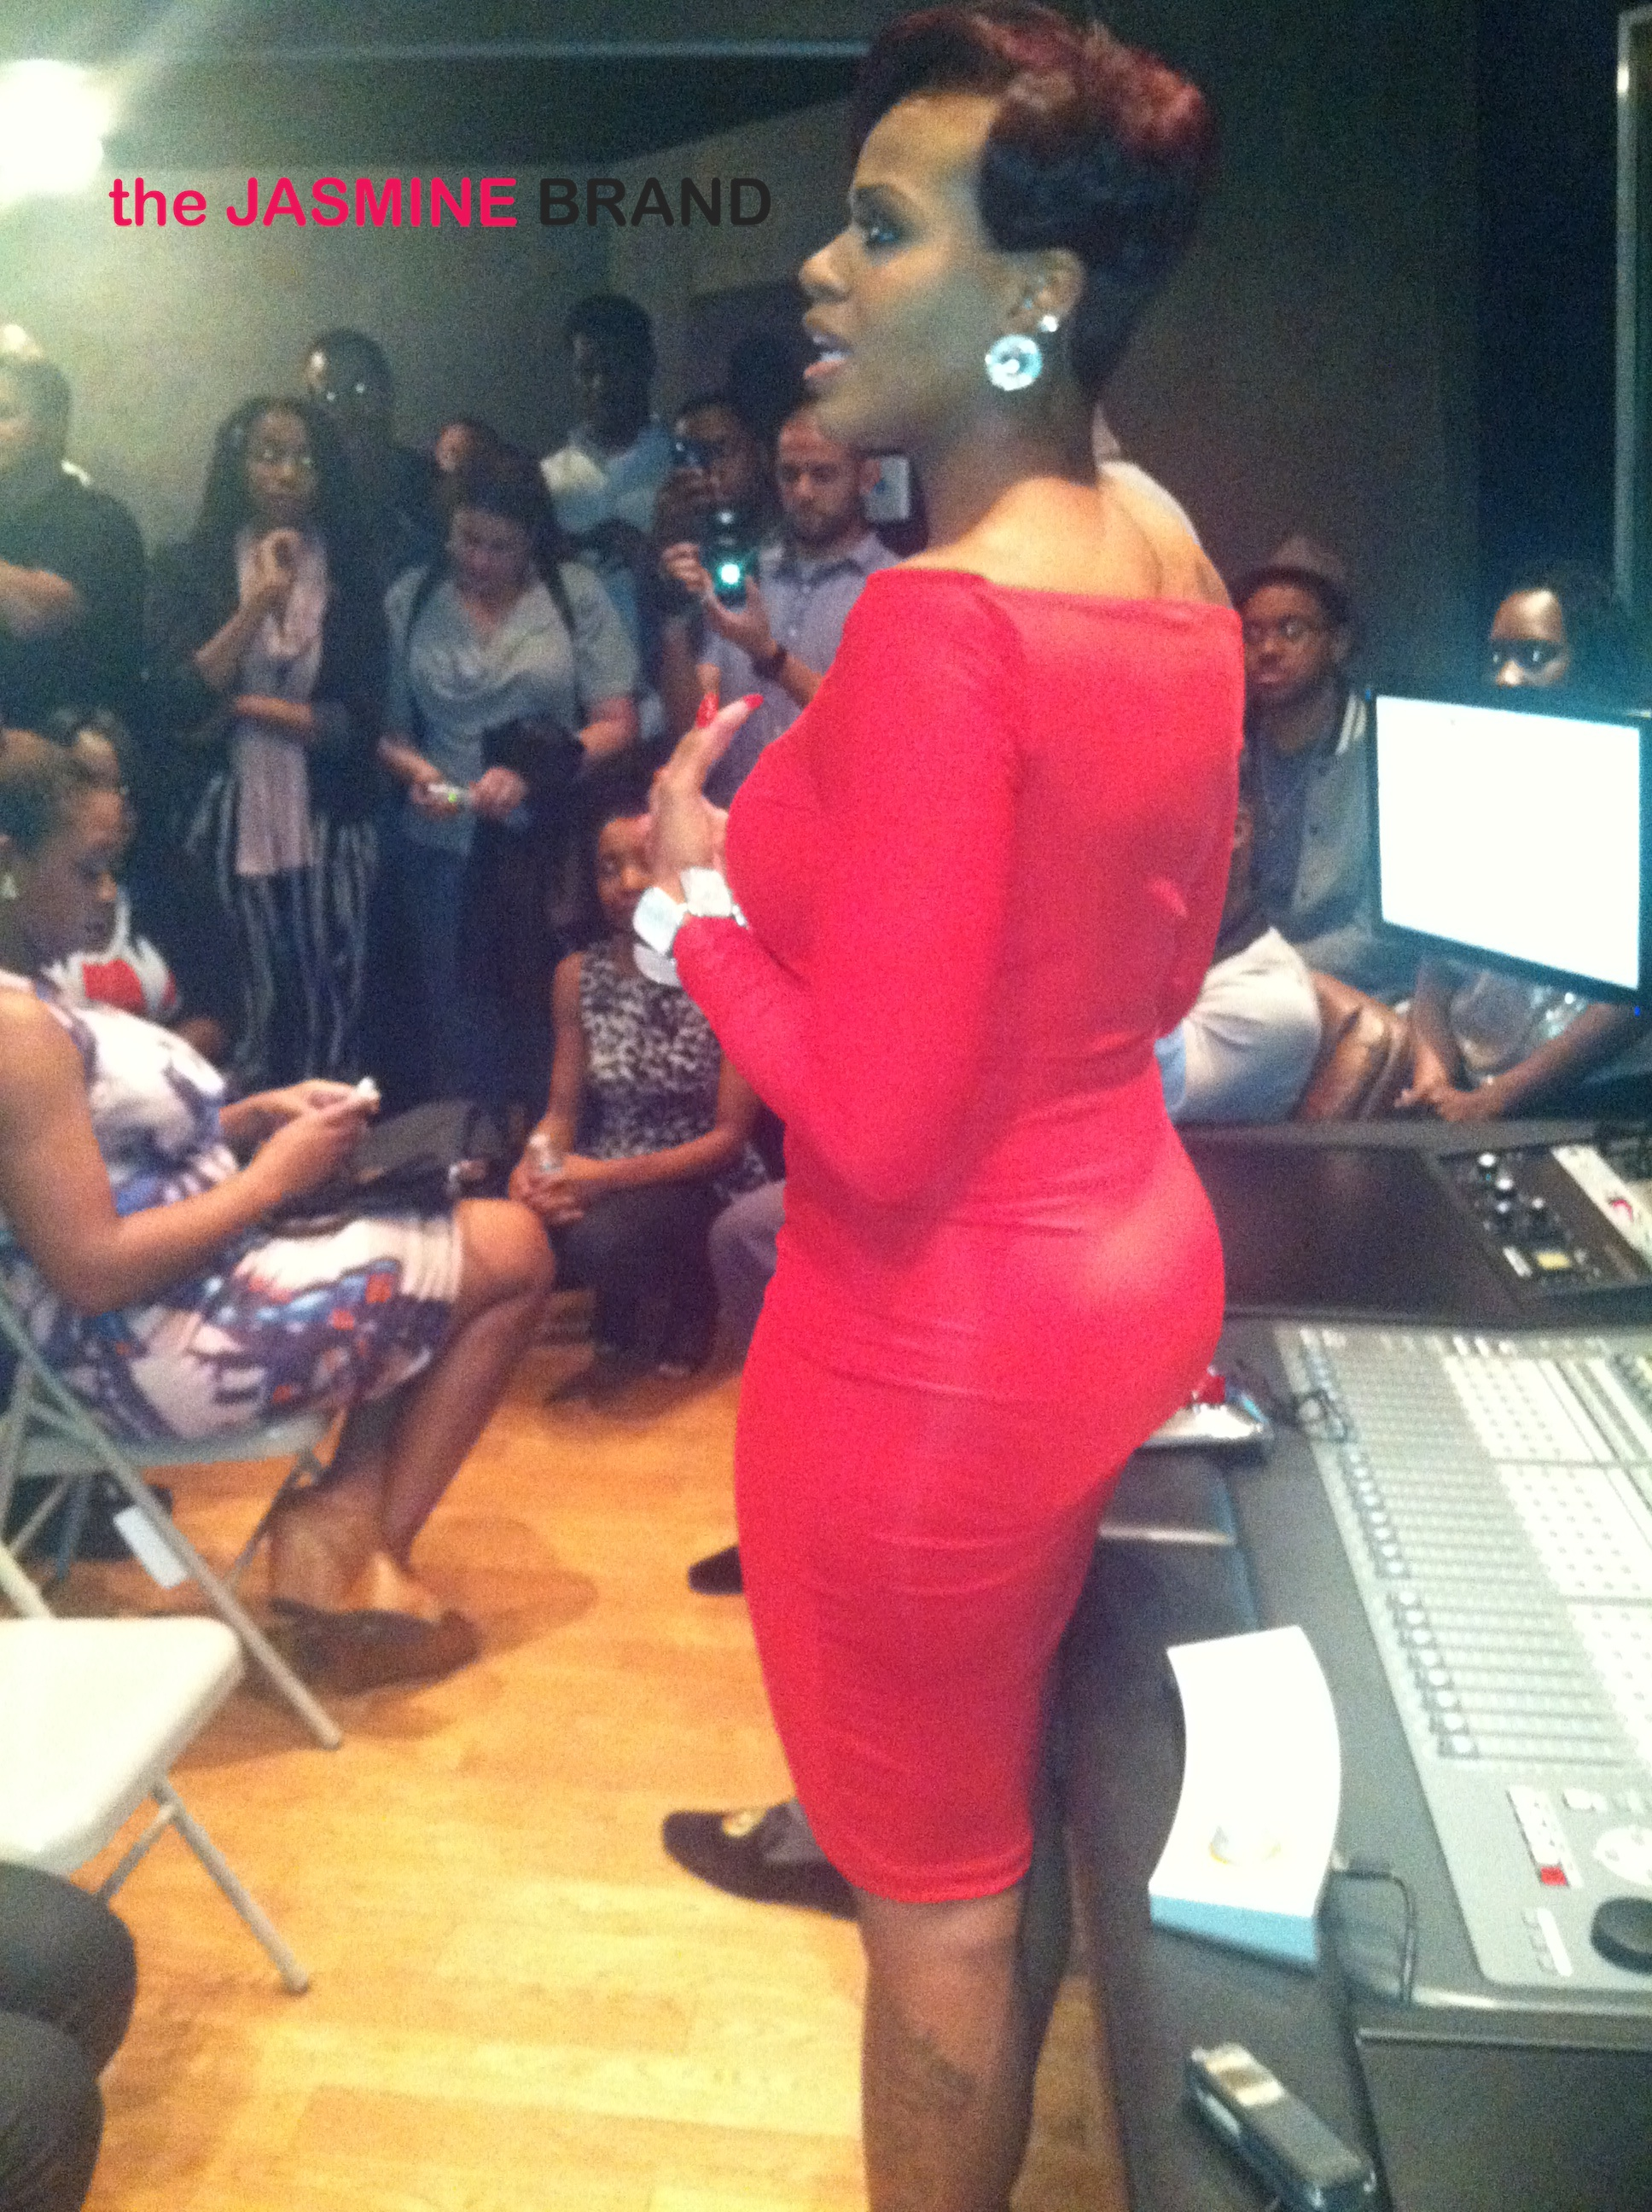 ... Williams, Amber Riley Attend Fantasia's Album Listening Session